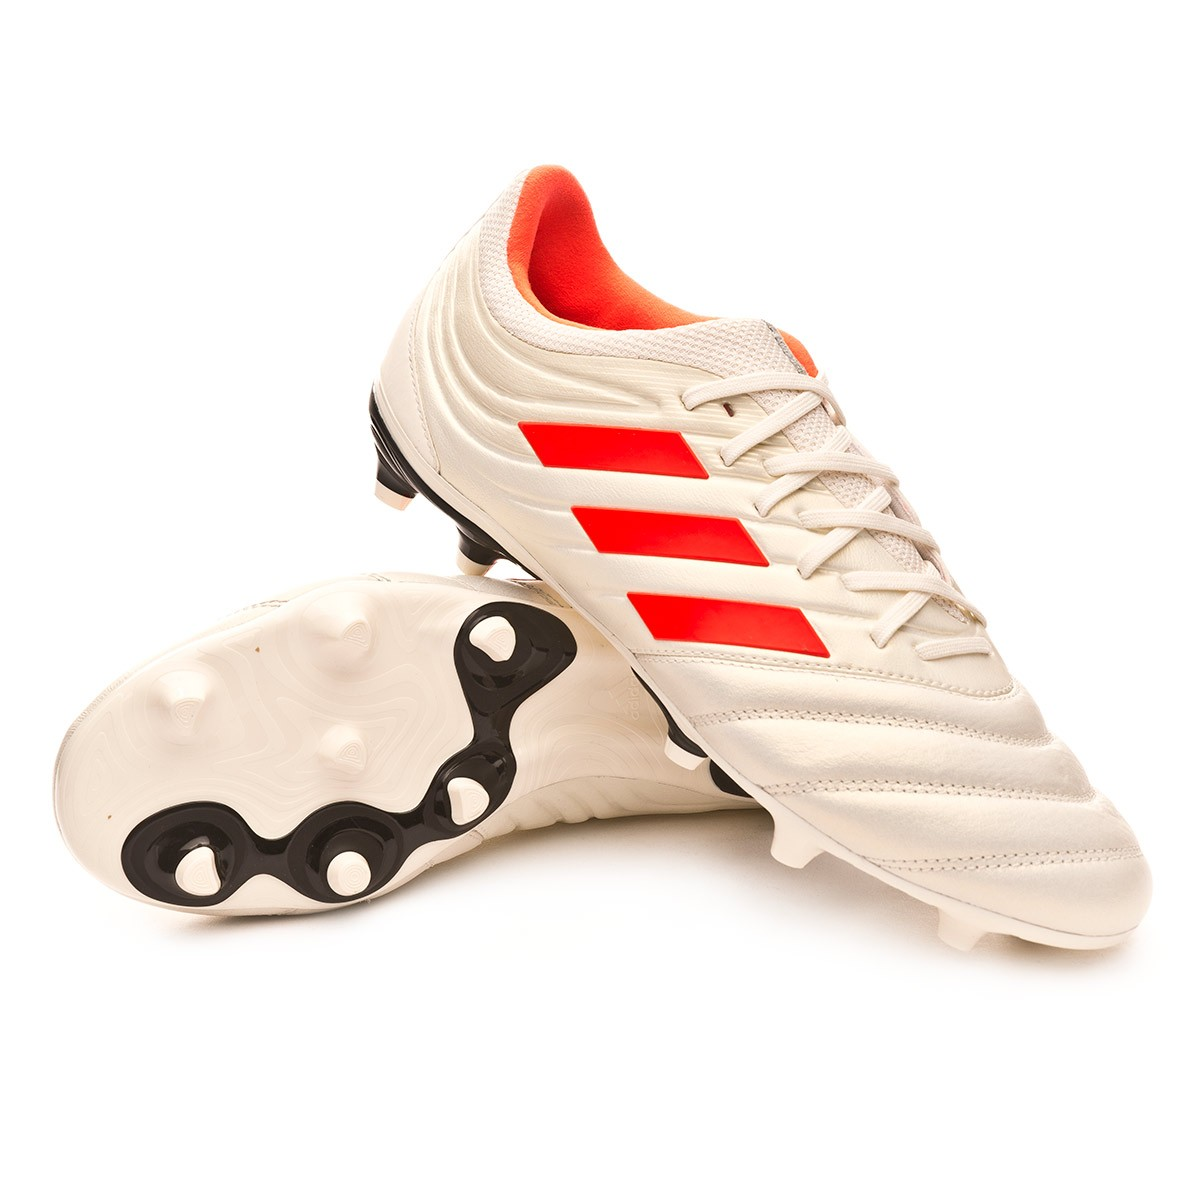 Boot adidas Copa 19.3 FG Off white-Solar red-Core black - Football ... e2f01800c8d2b